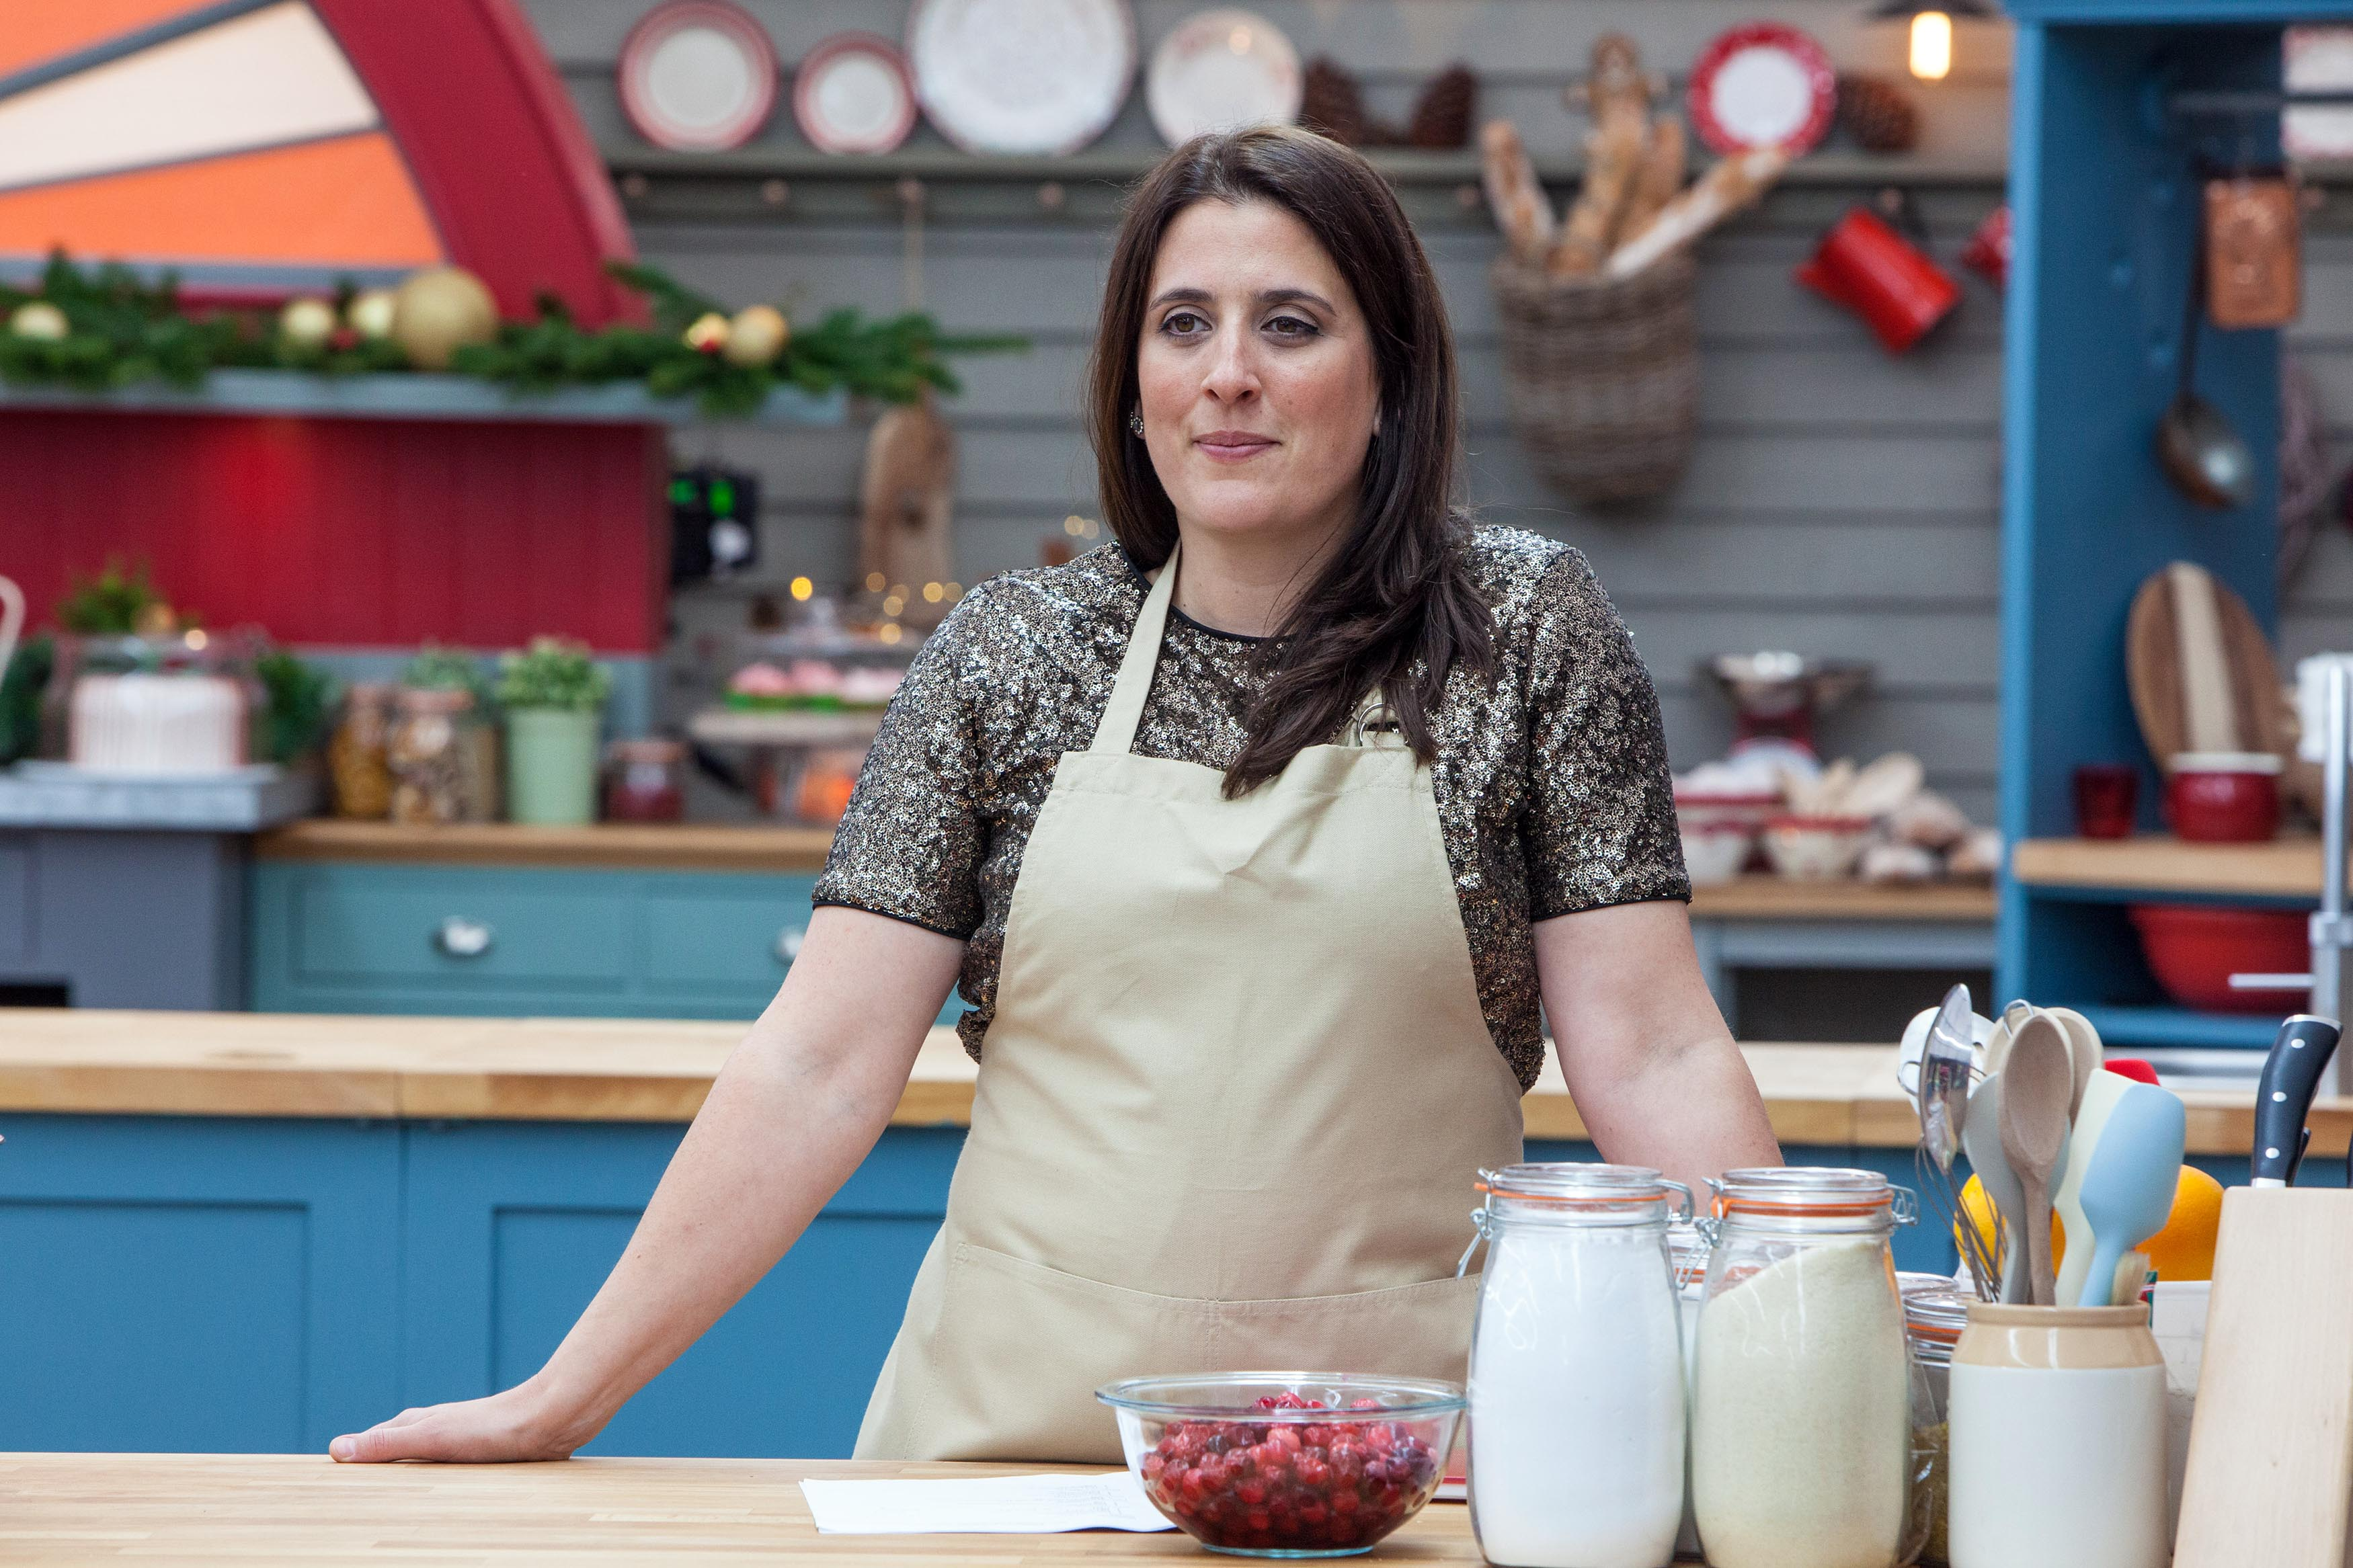 Beca Lyne-Pirkis Bake Off (Channel 4, EH)